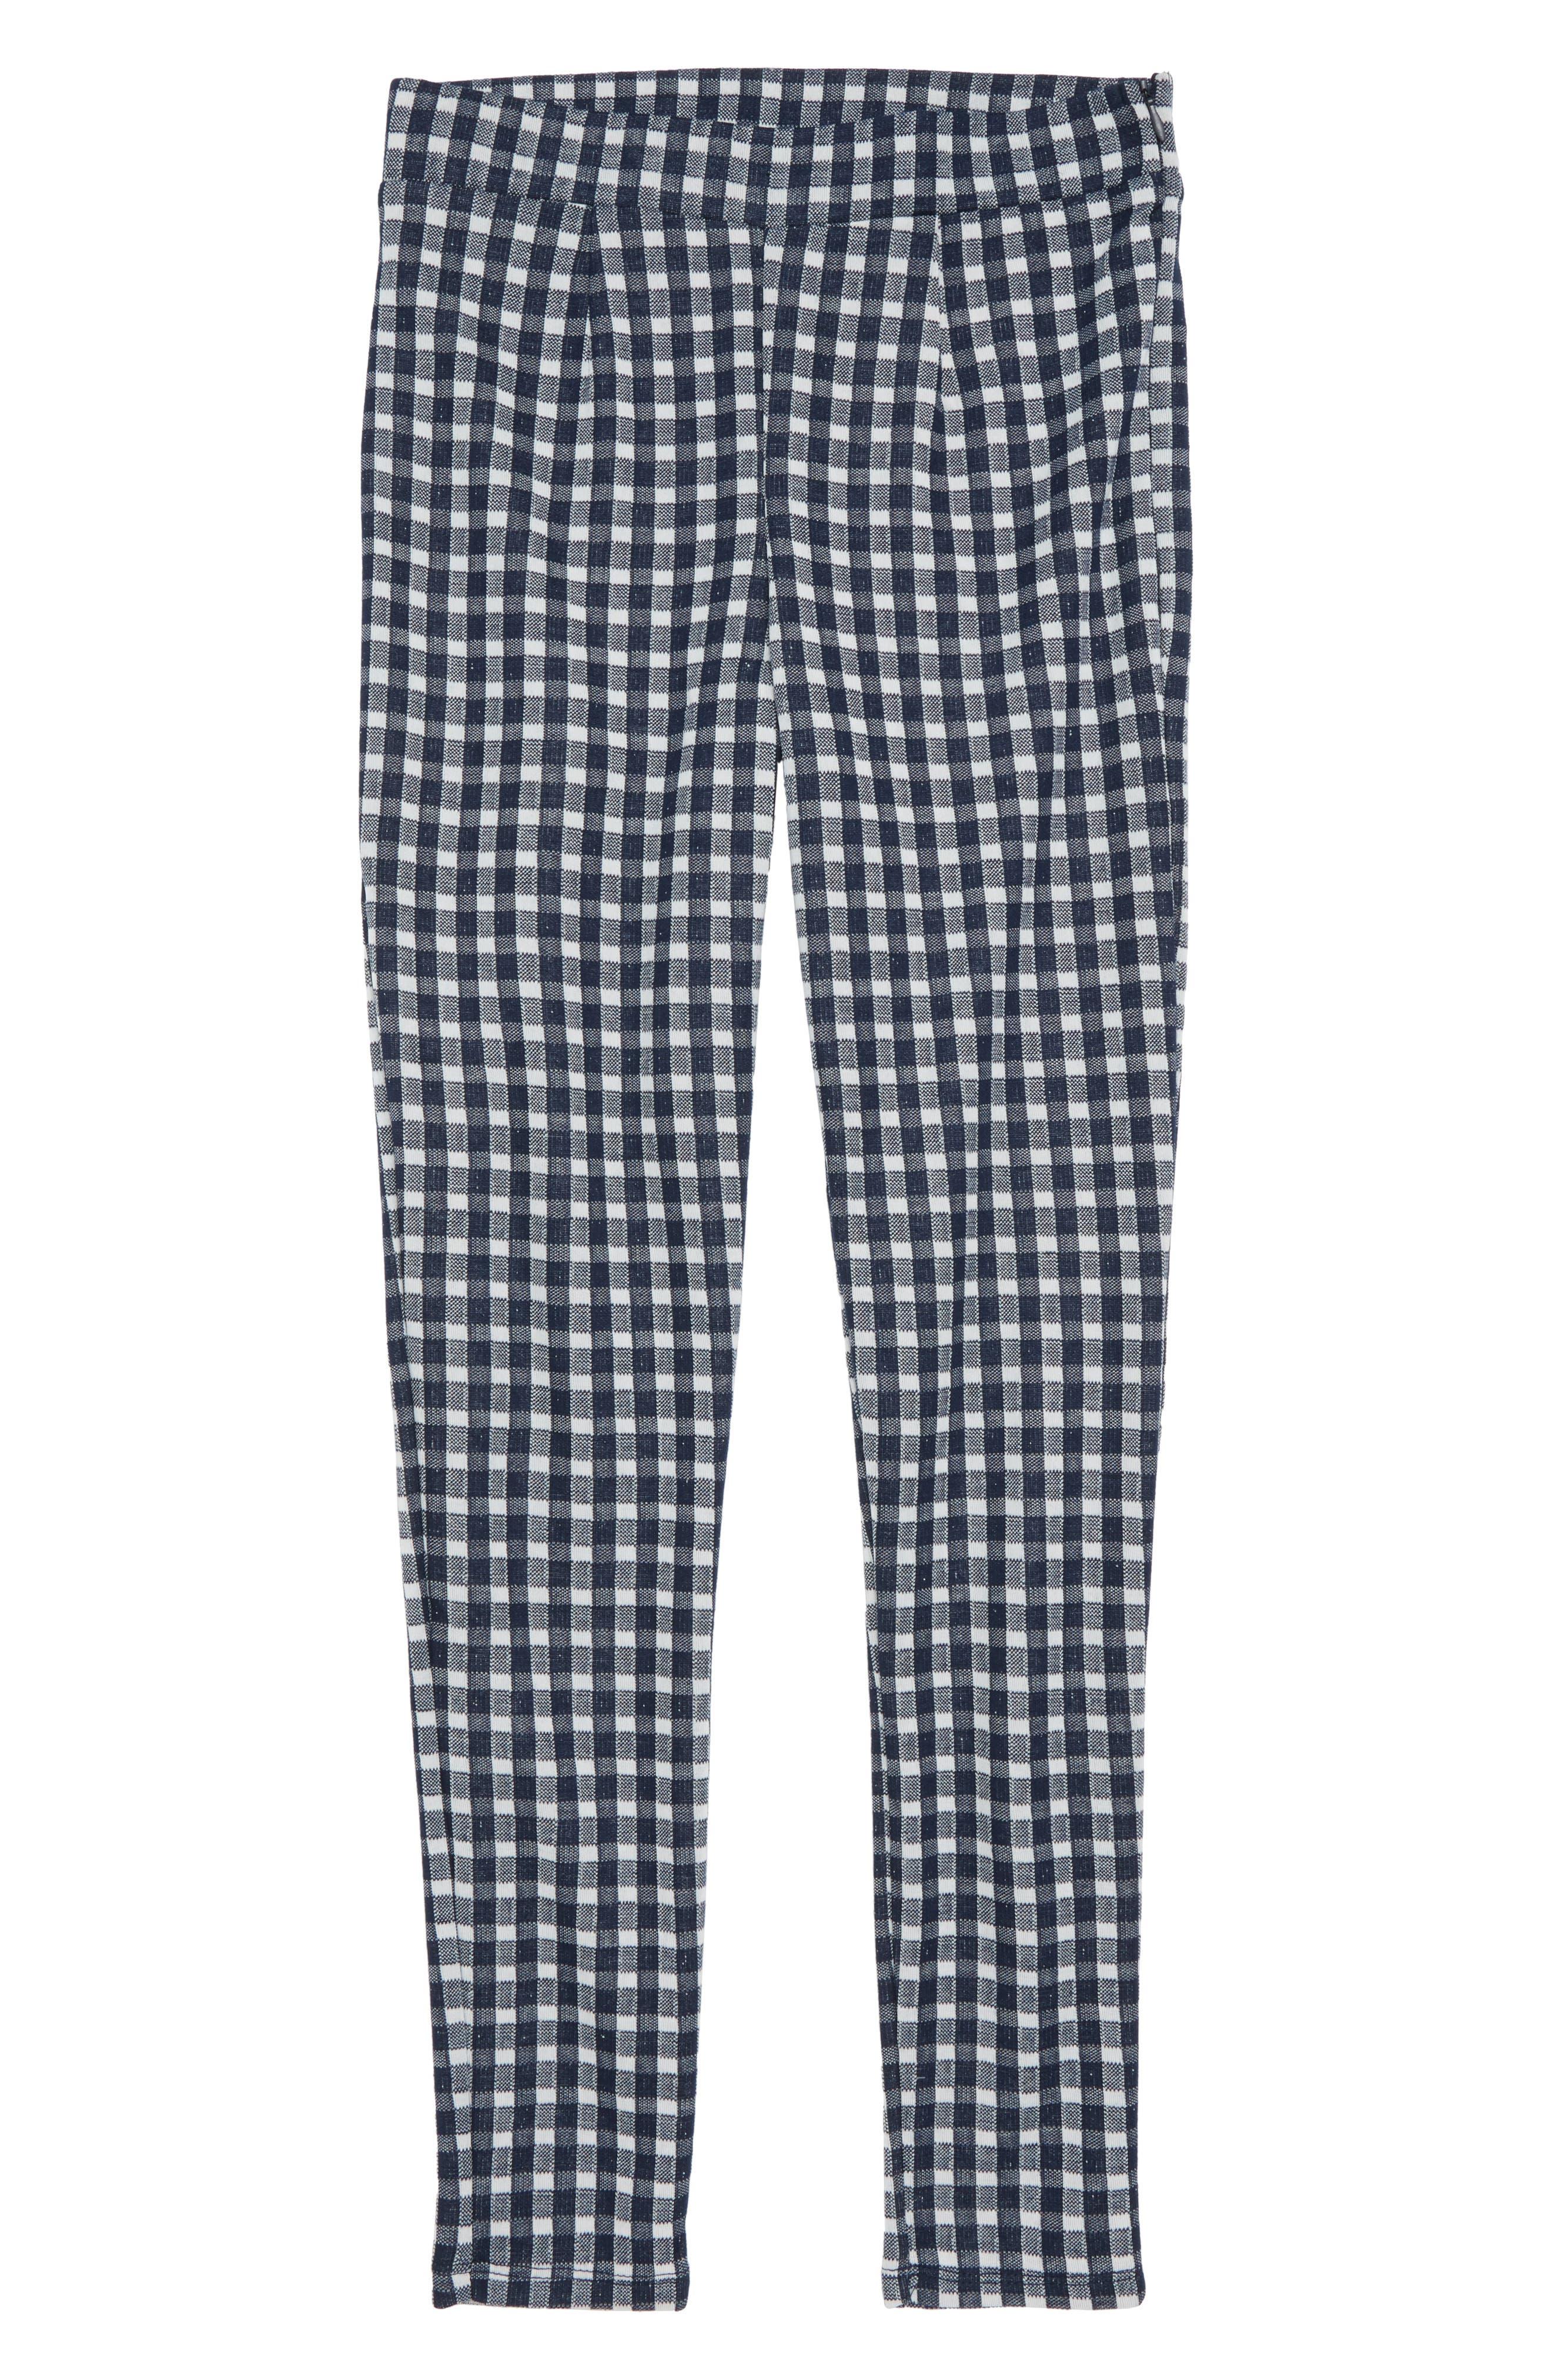 Plaid Pants,                             Main thumbnail 1, color,                             Navy/ White